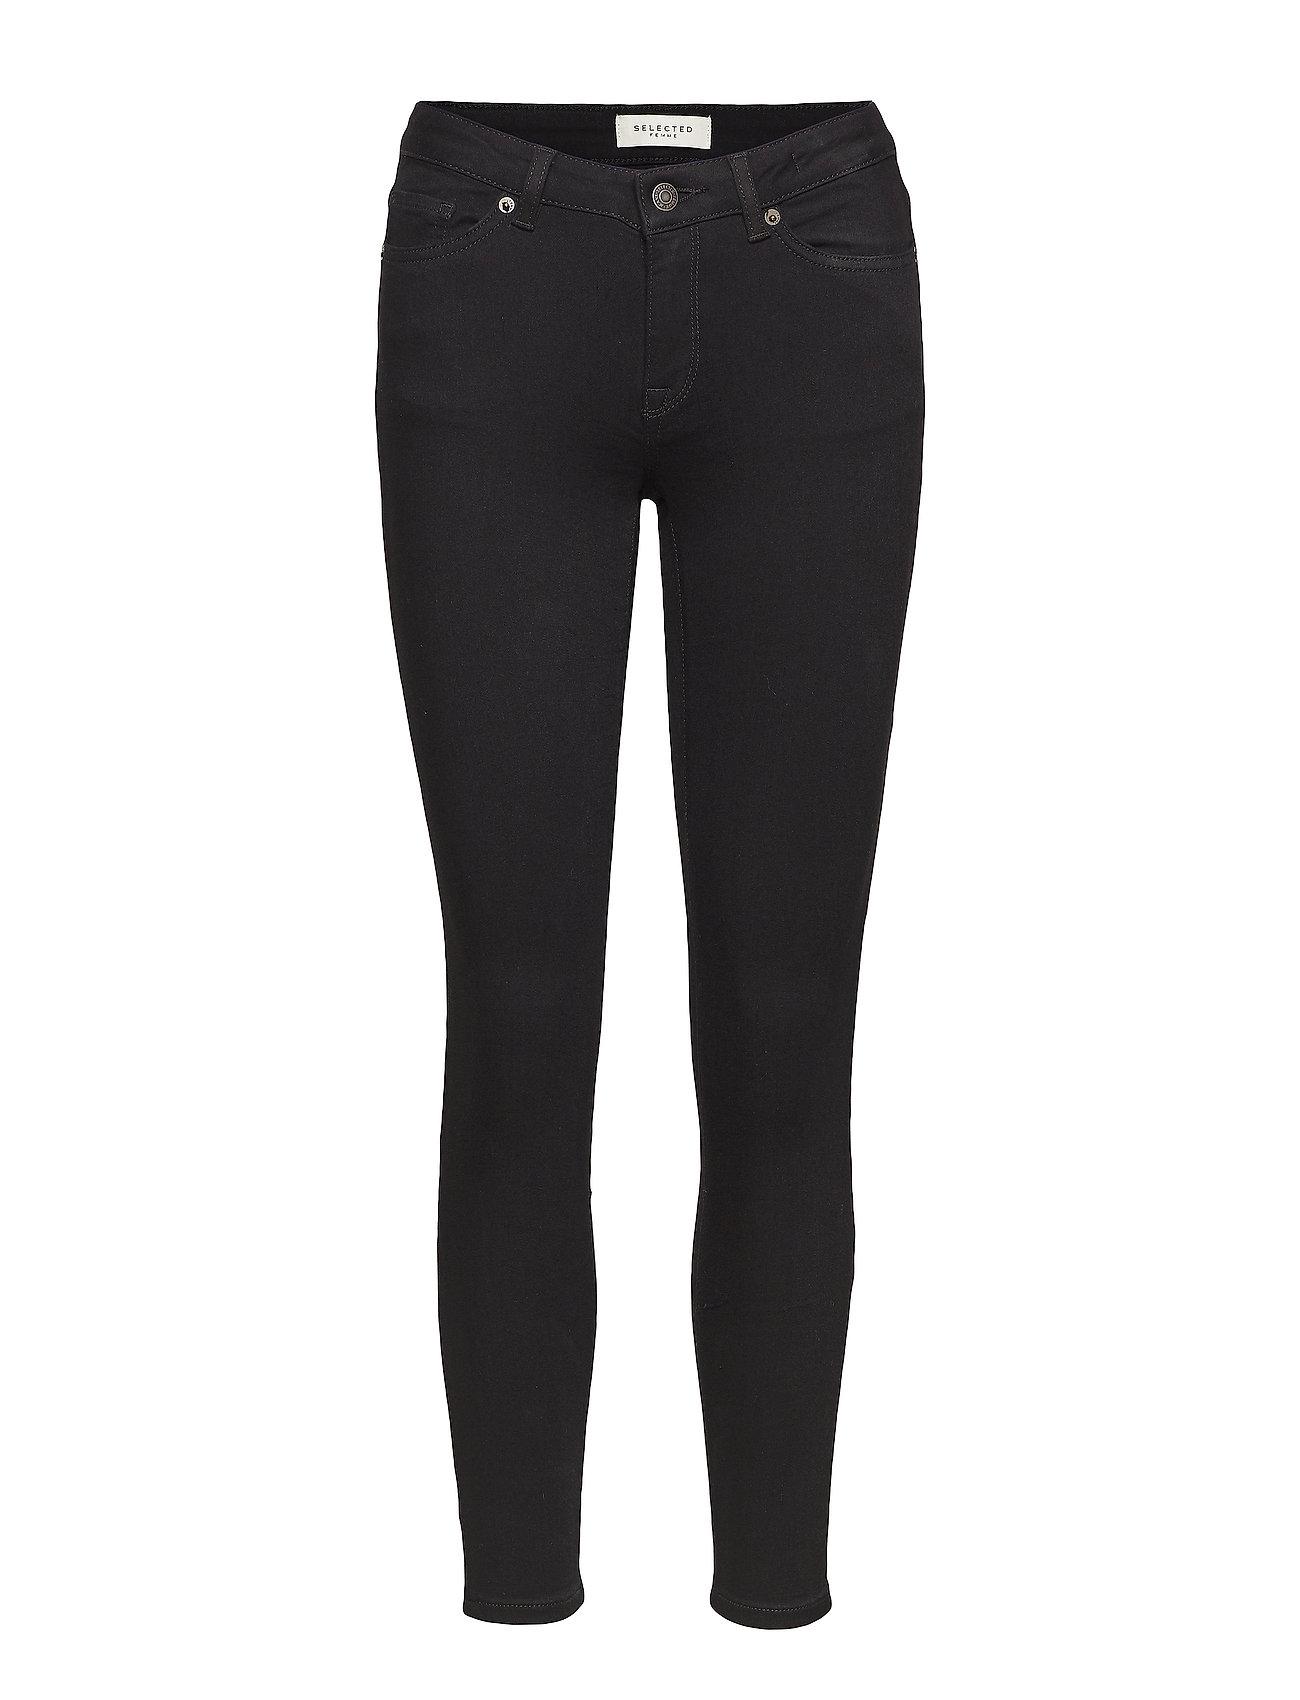 Selected Femme SLFIDA MW SKINNY svart JEANS W NOOS Jeans